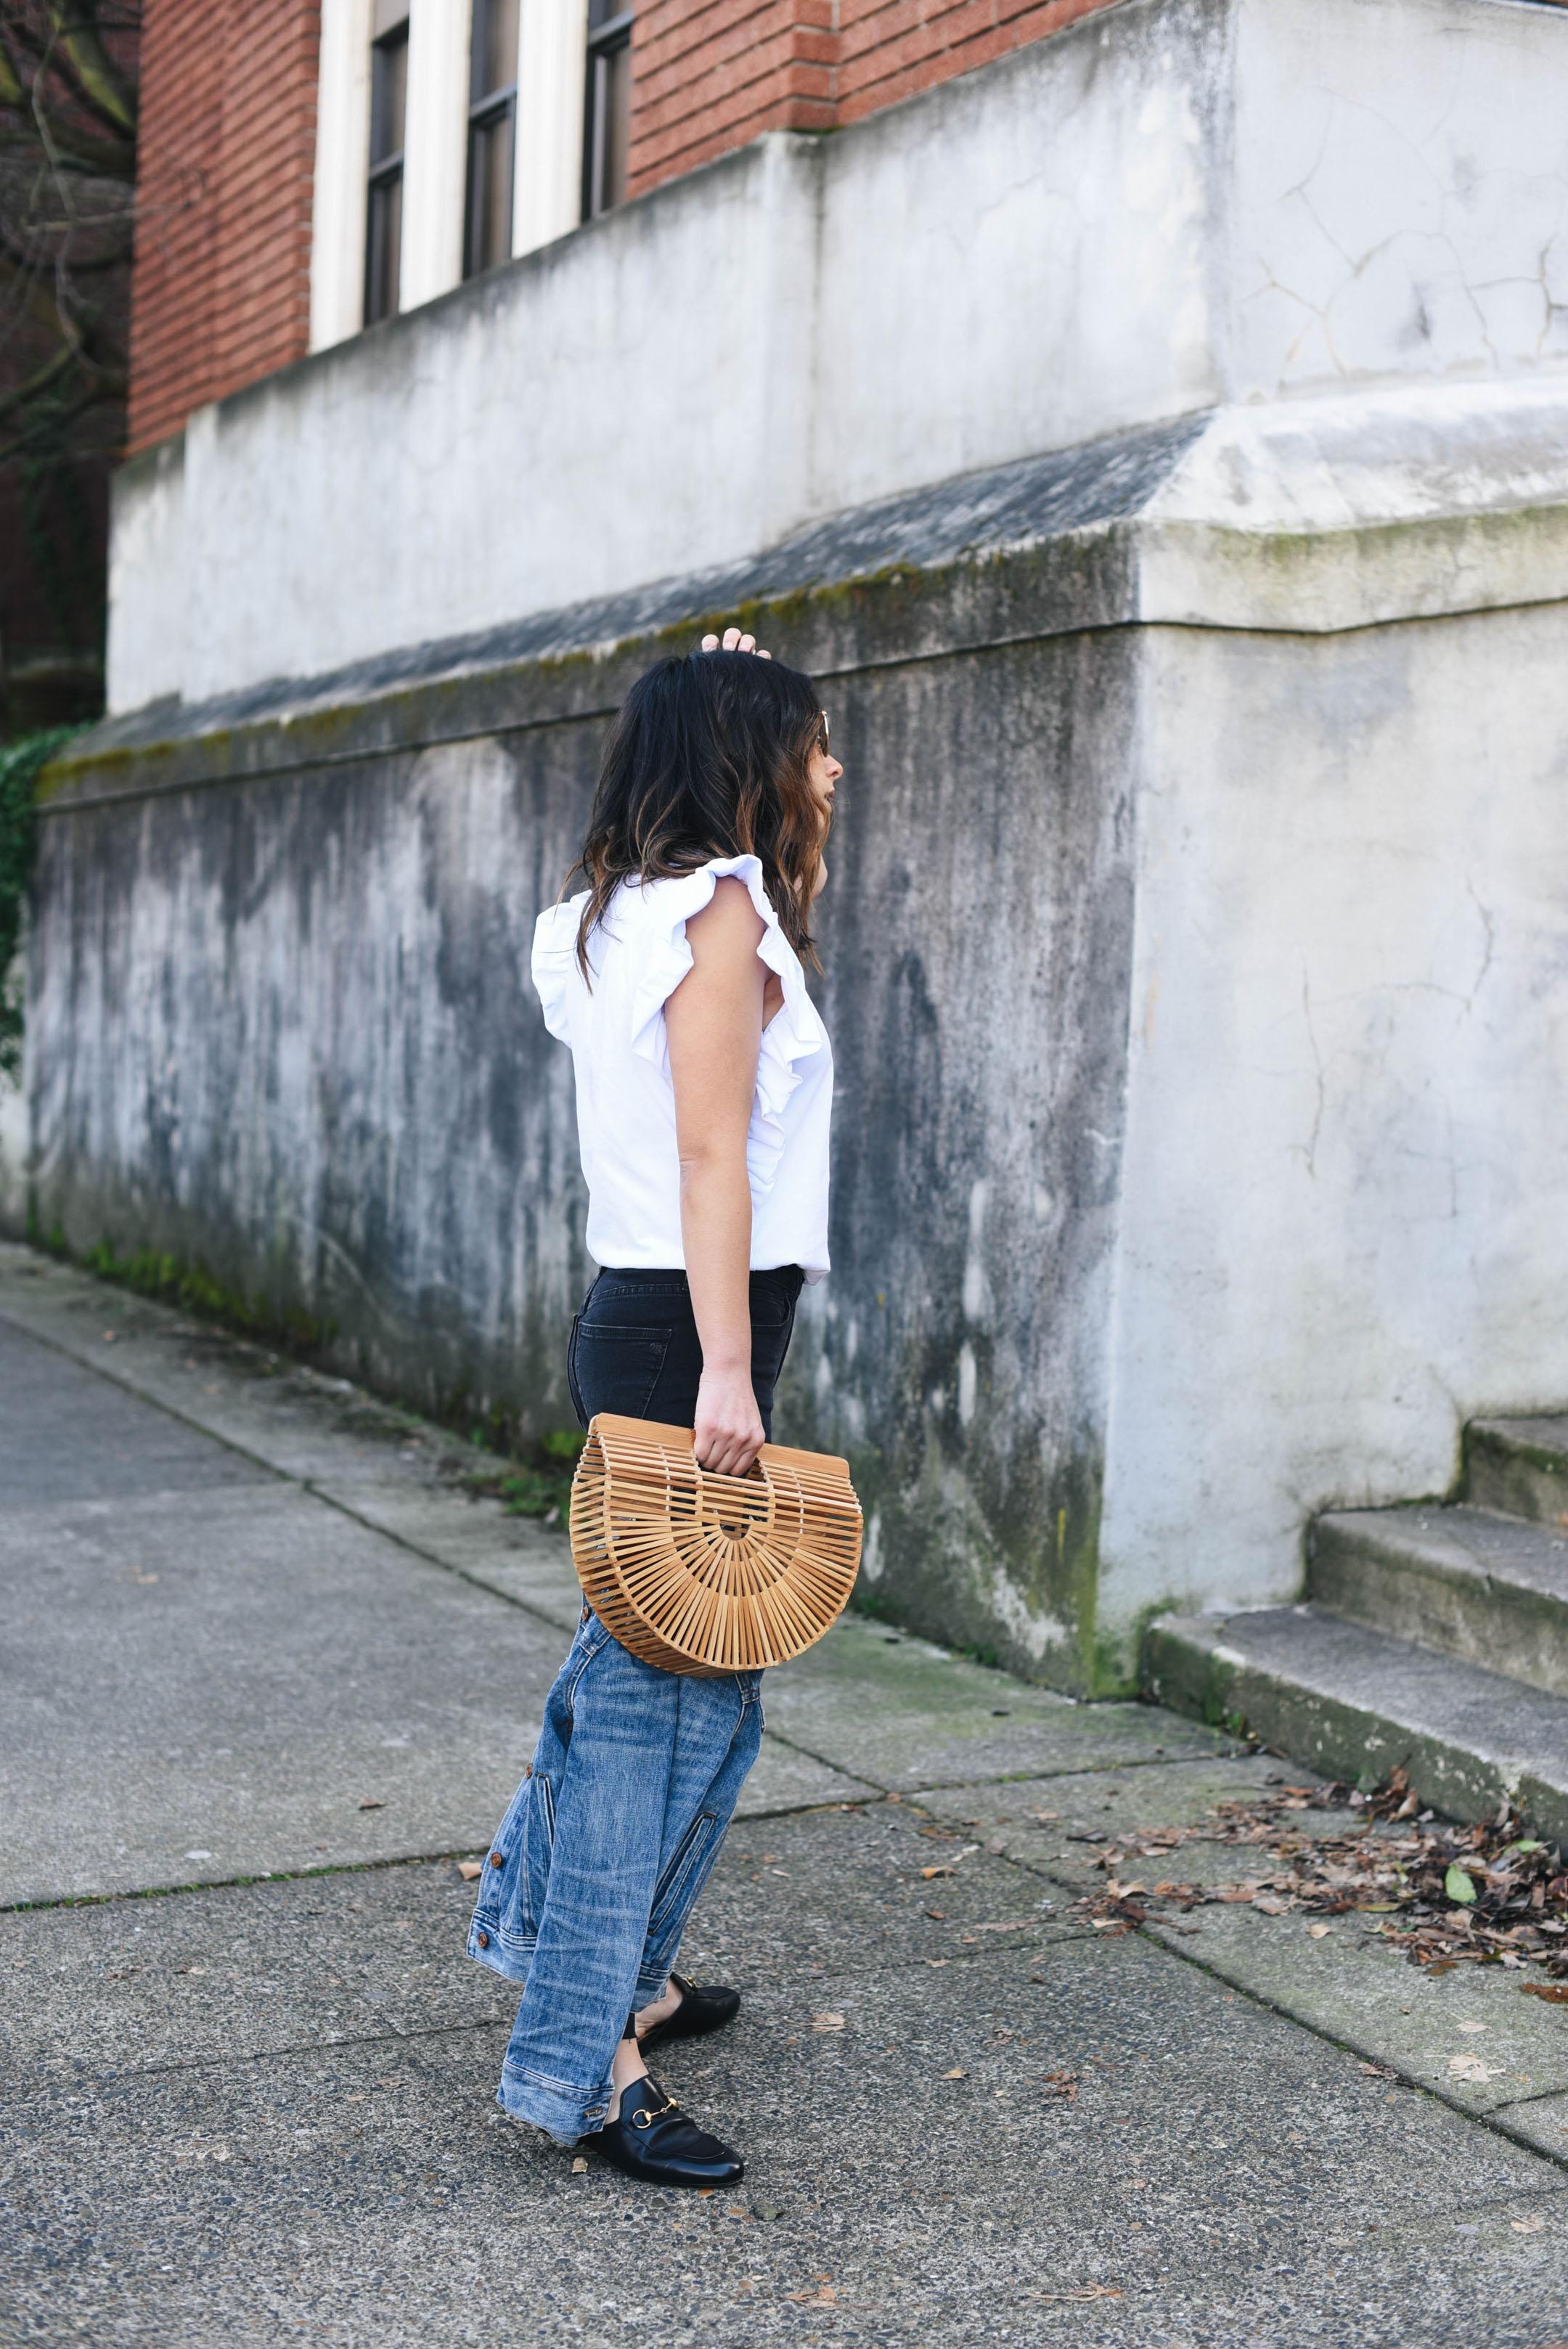 Crystalin Marie wearing Cult Gaia ark bag